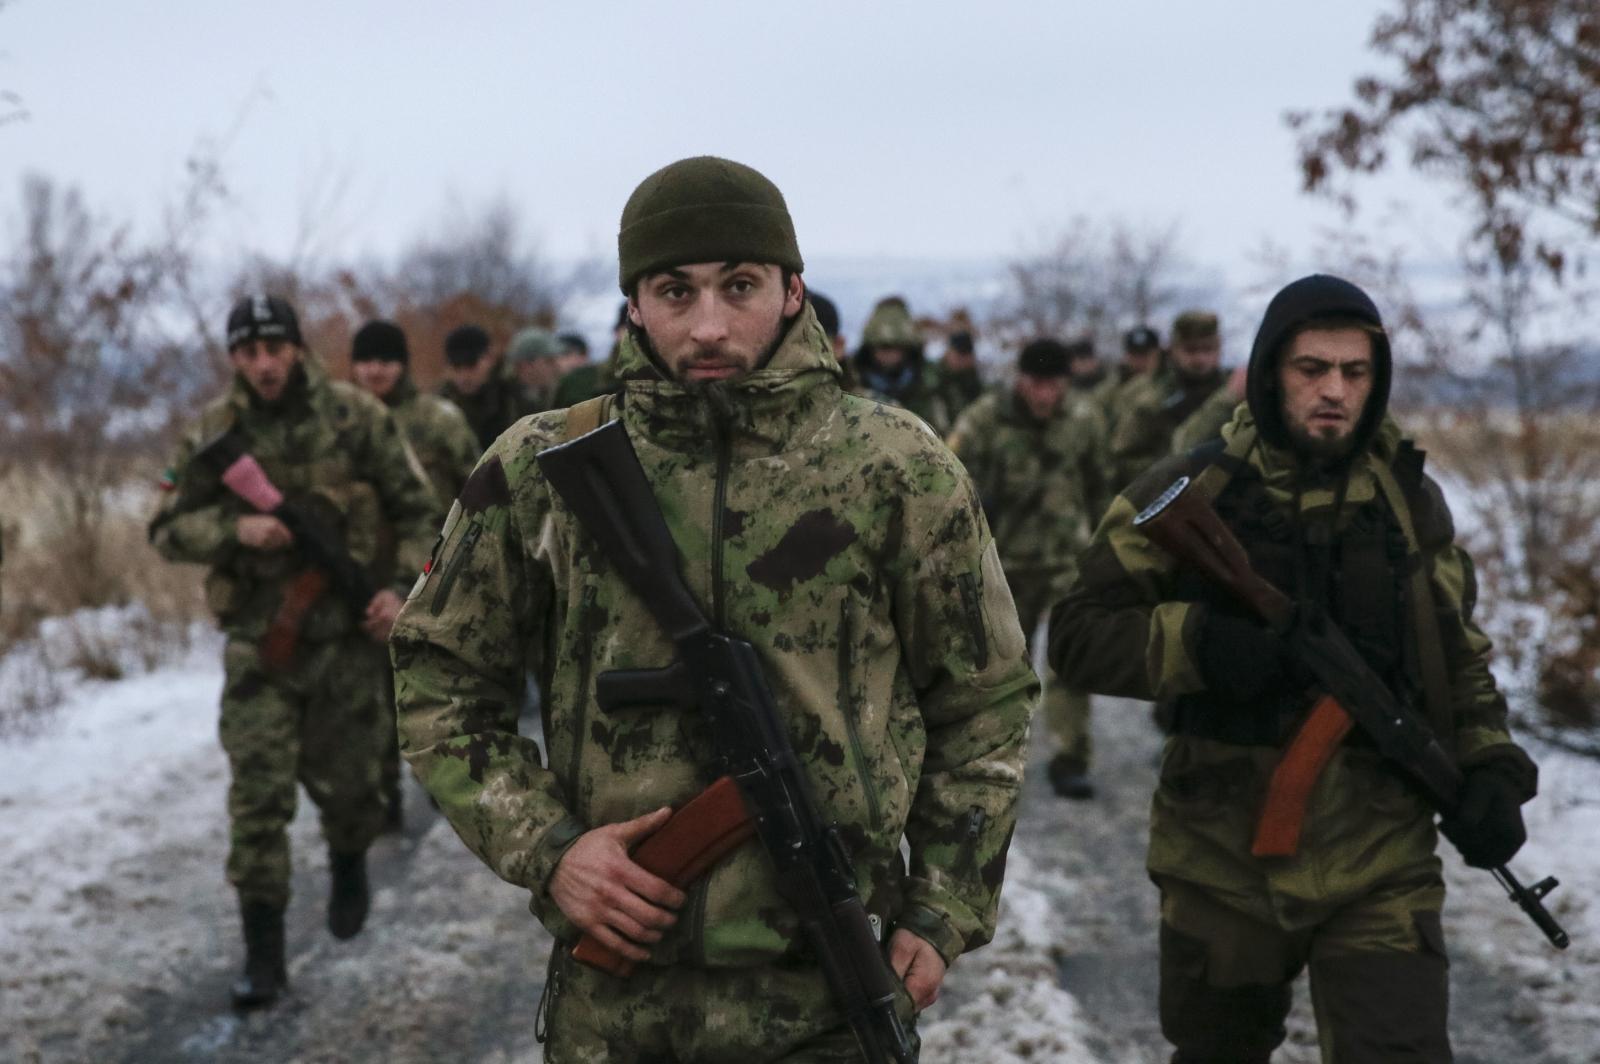 Chechen Death brigade